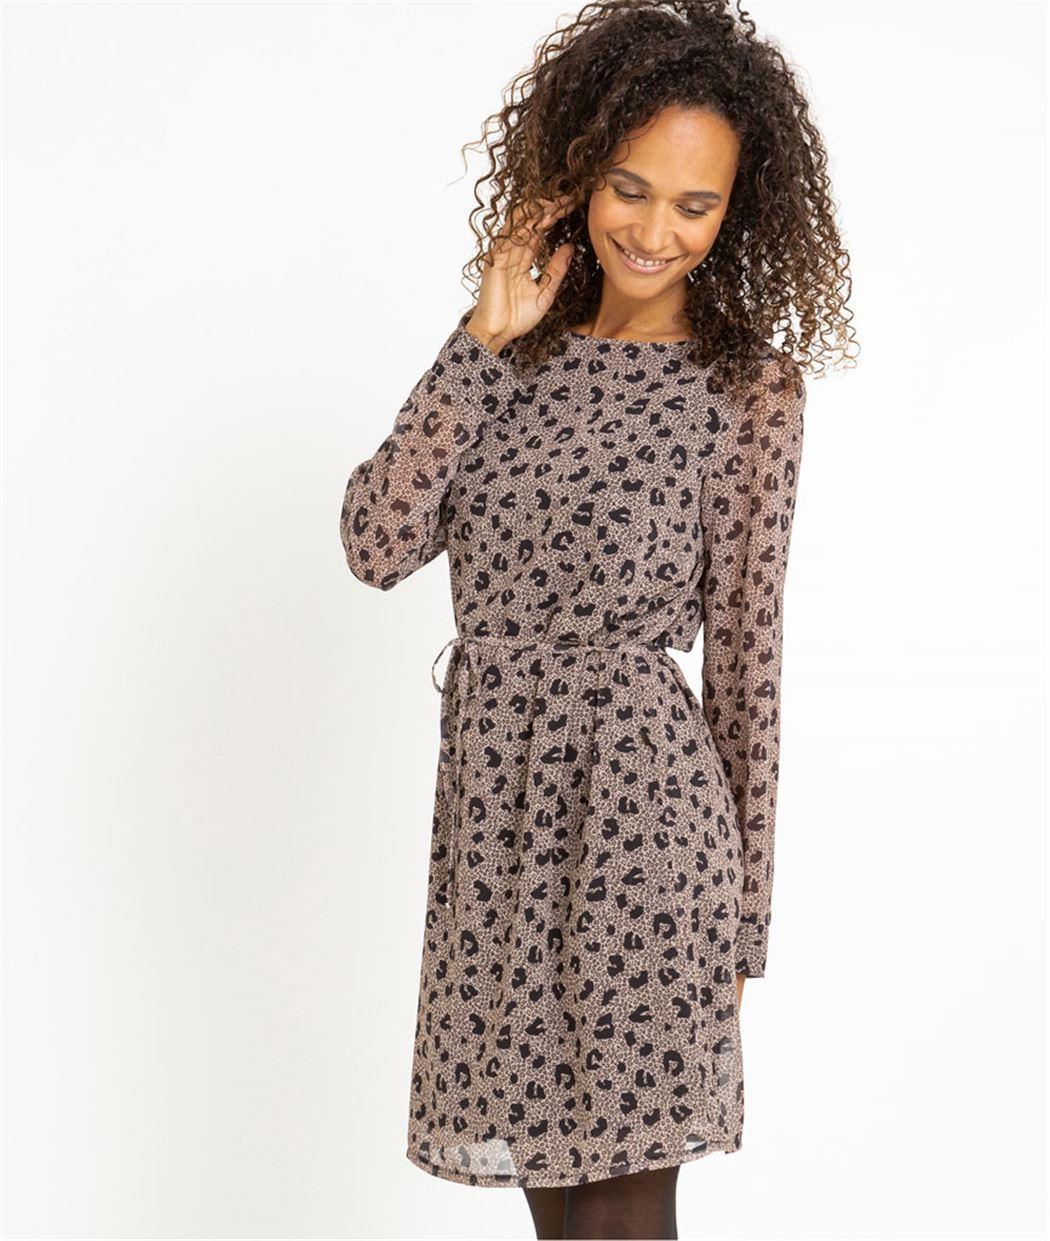 Robe femme fluide imprimé léopard BEIGE